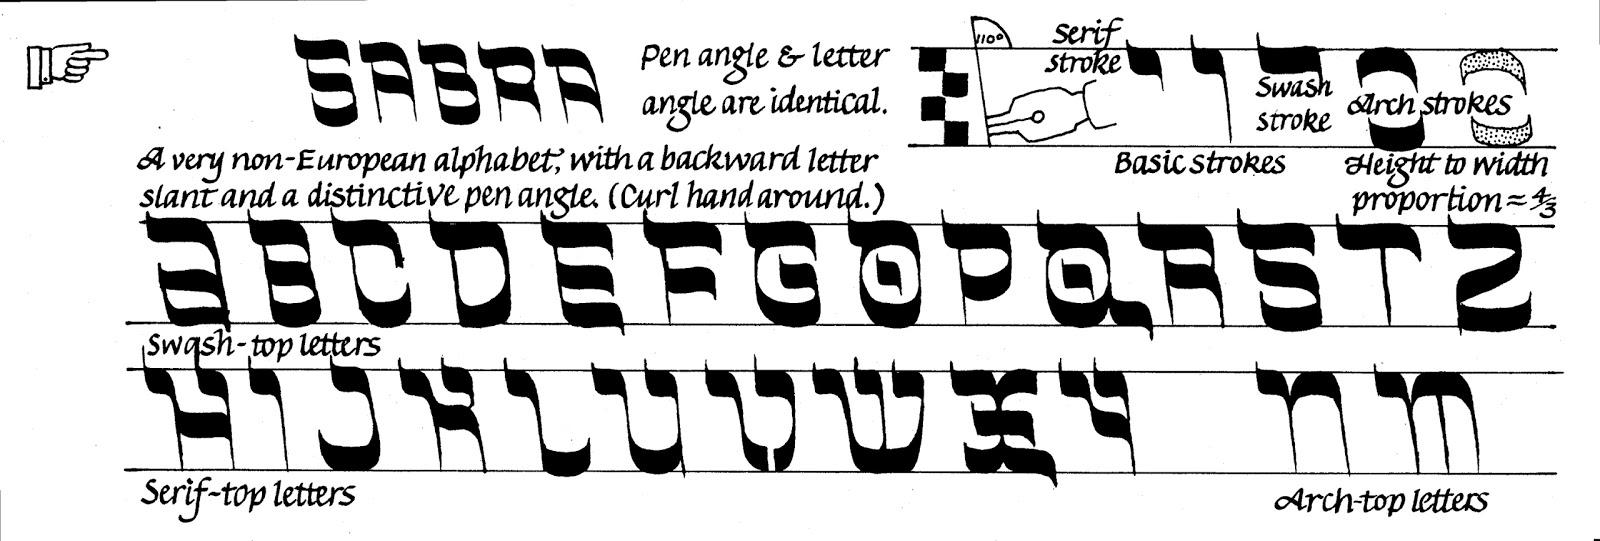 Margaret Shepherd Calligraphy Blog 209 Rosh Hahanah